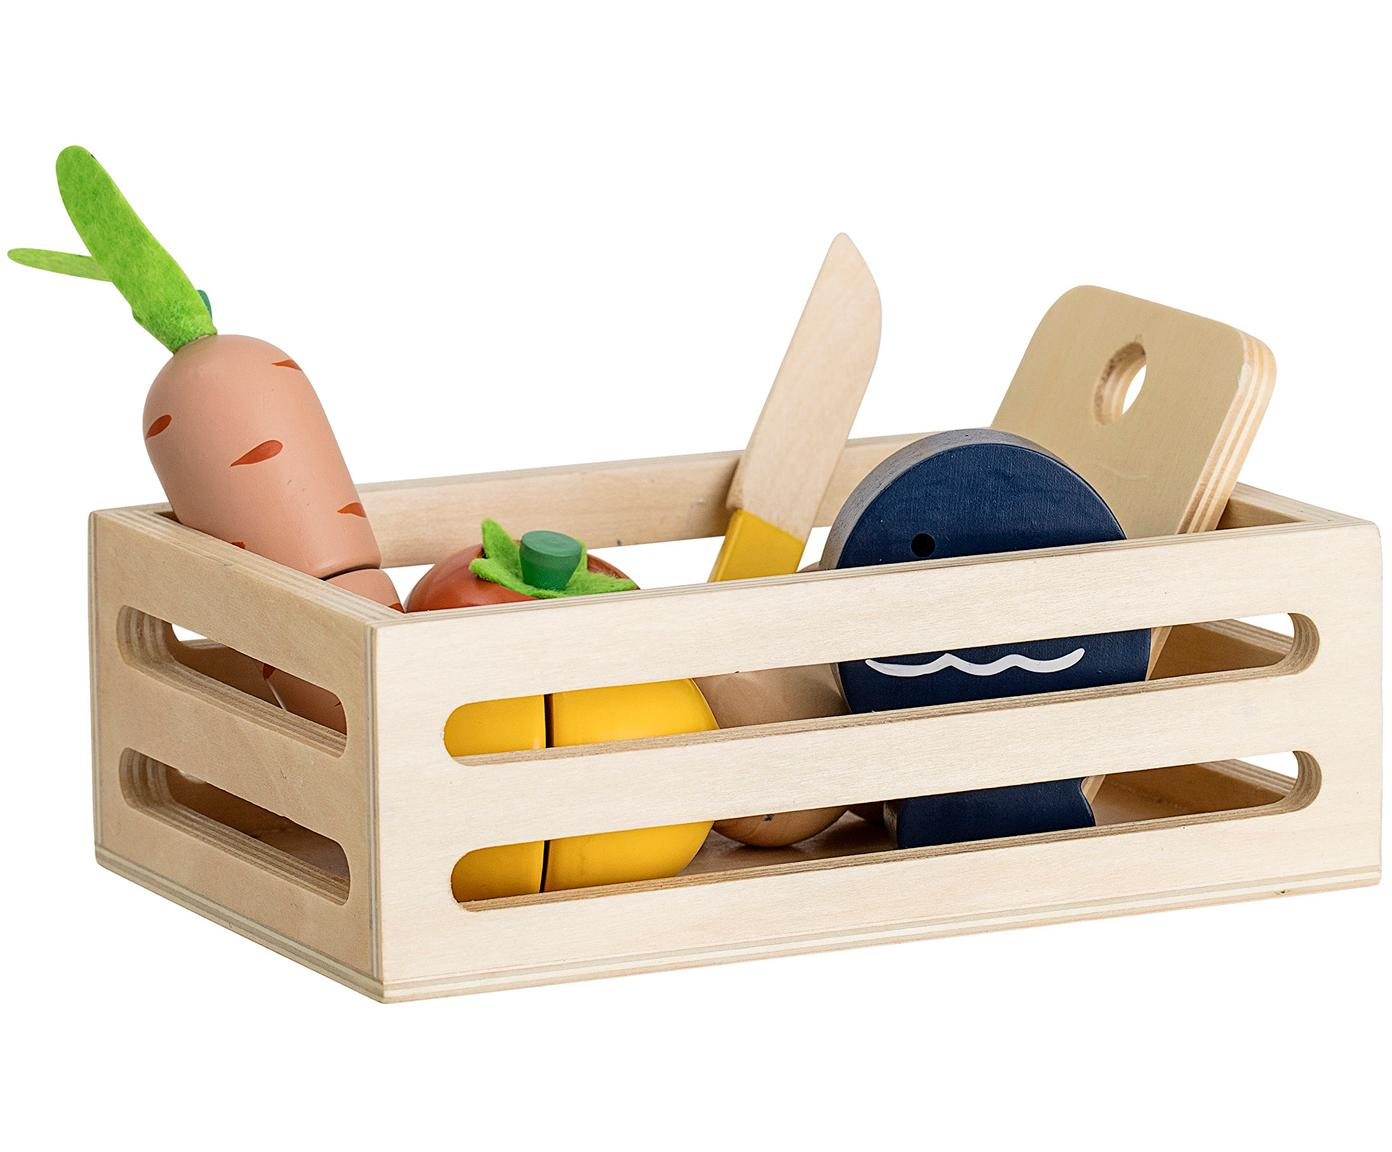 Set de juguetes Foodbox, 8pzas., Madera contrachapada, tablero de fibras de densidad media (MDF), Multicolor, An 18 x Al 6 cm